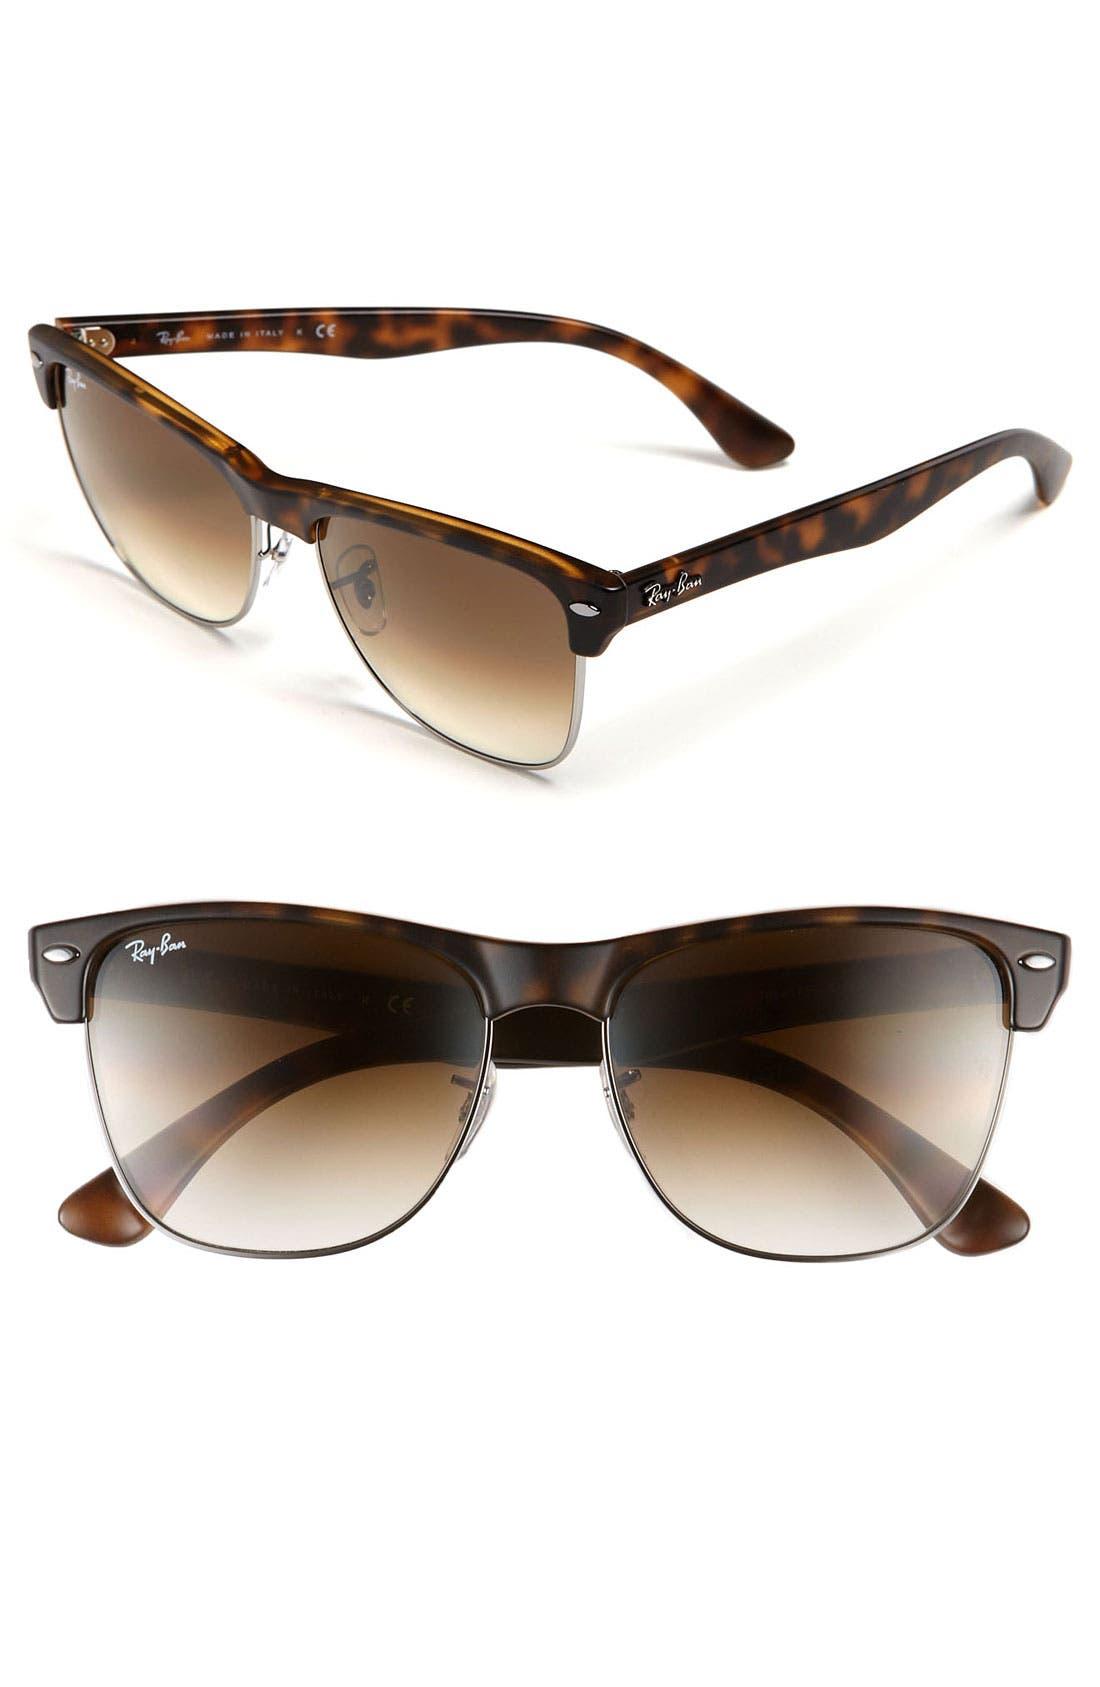 Main Image - Ray-Ban Highstreet 57mm Sunglasses